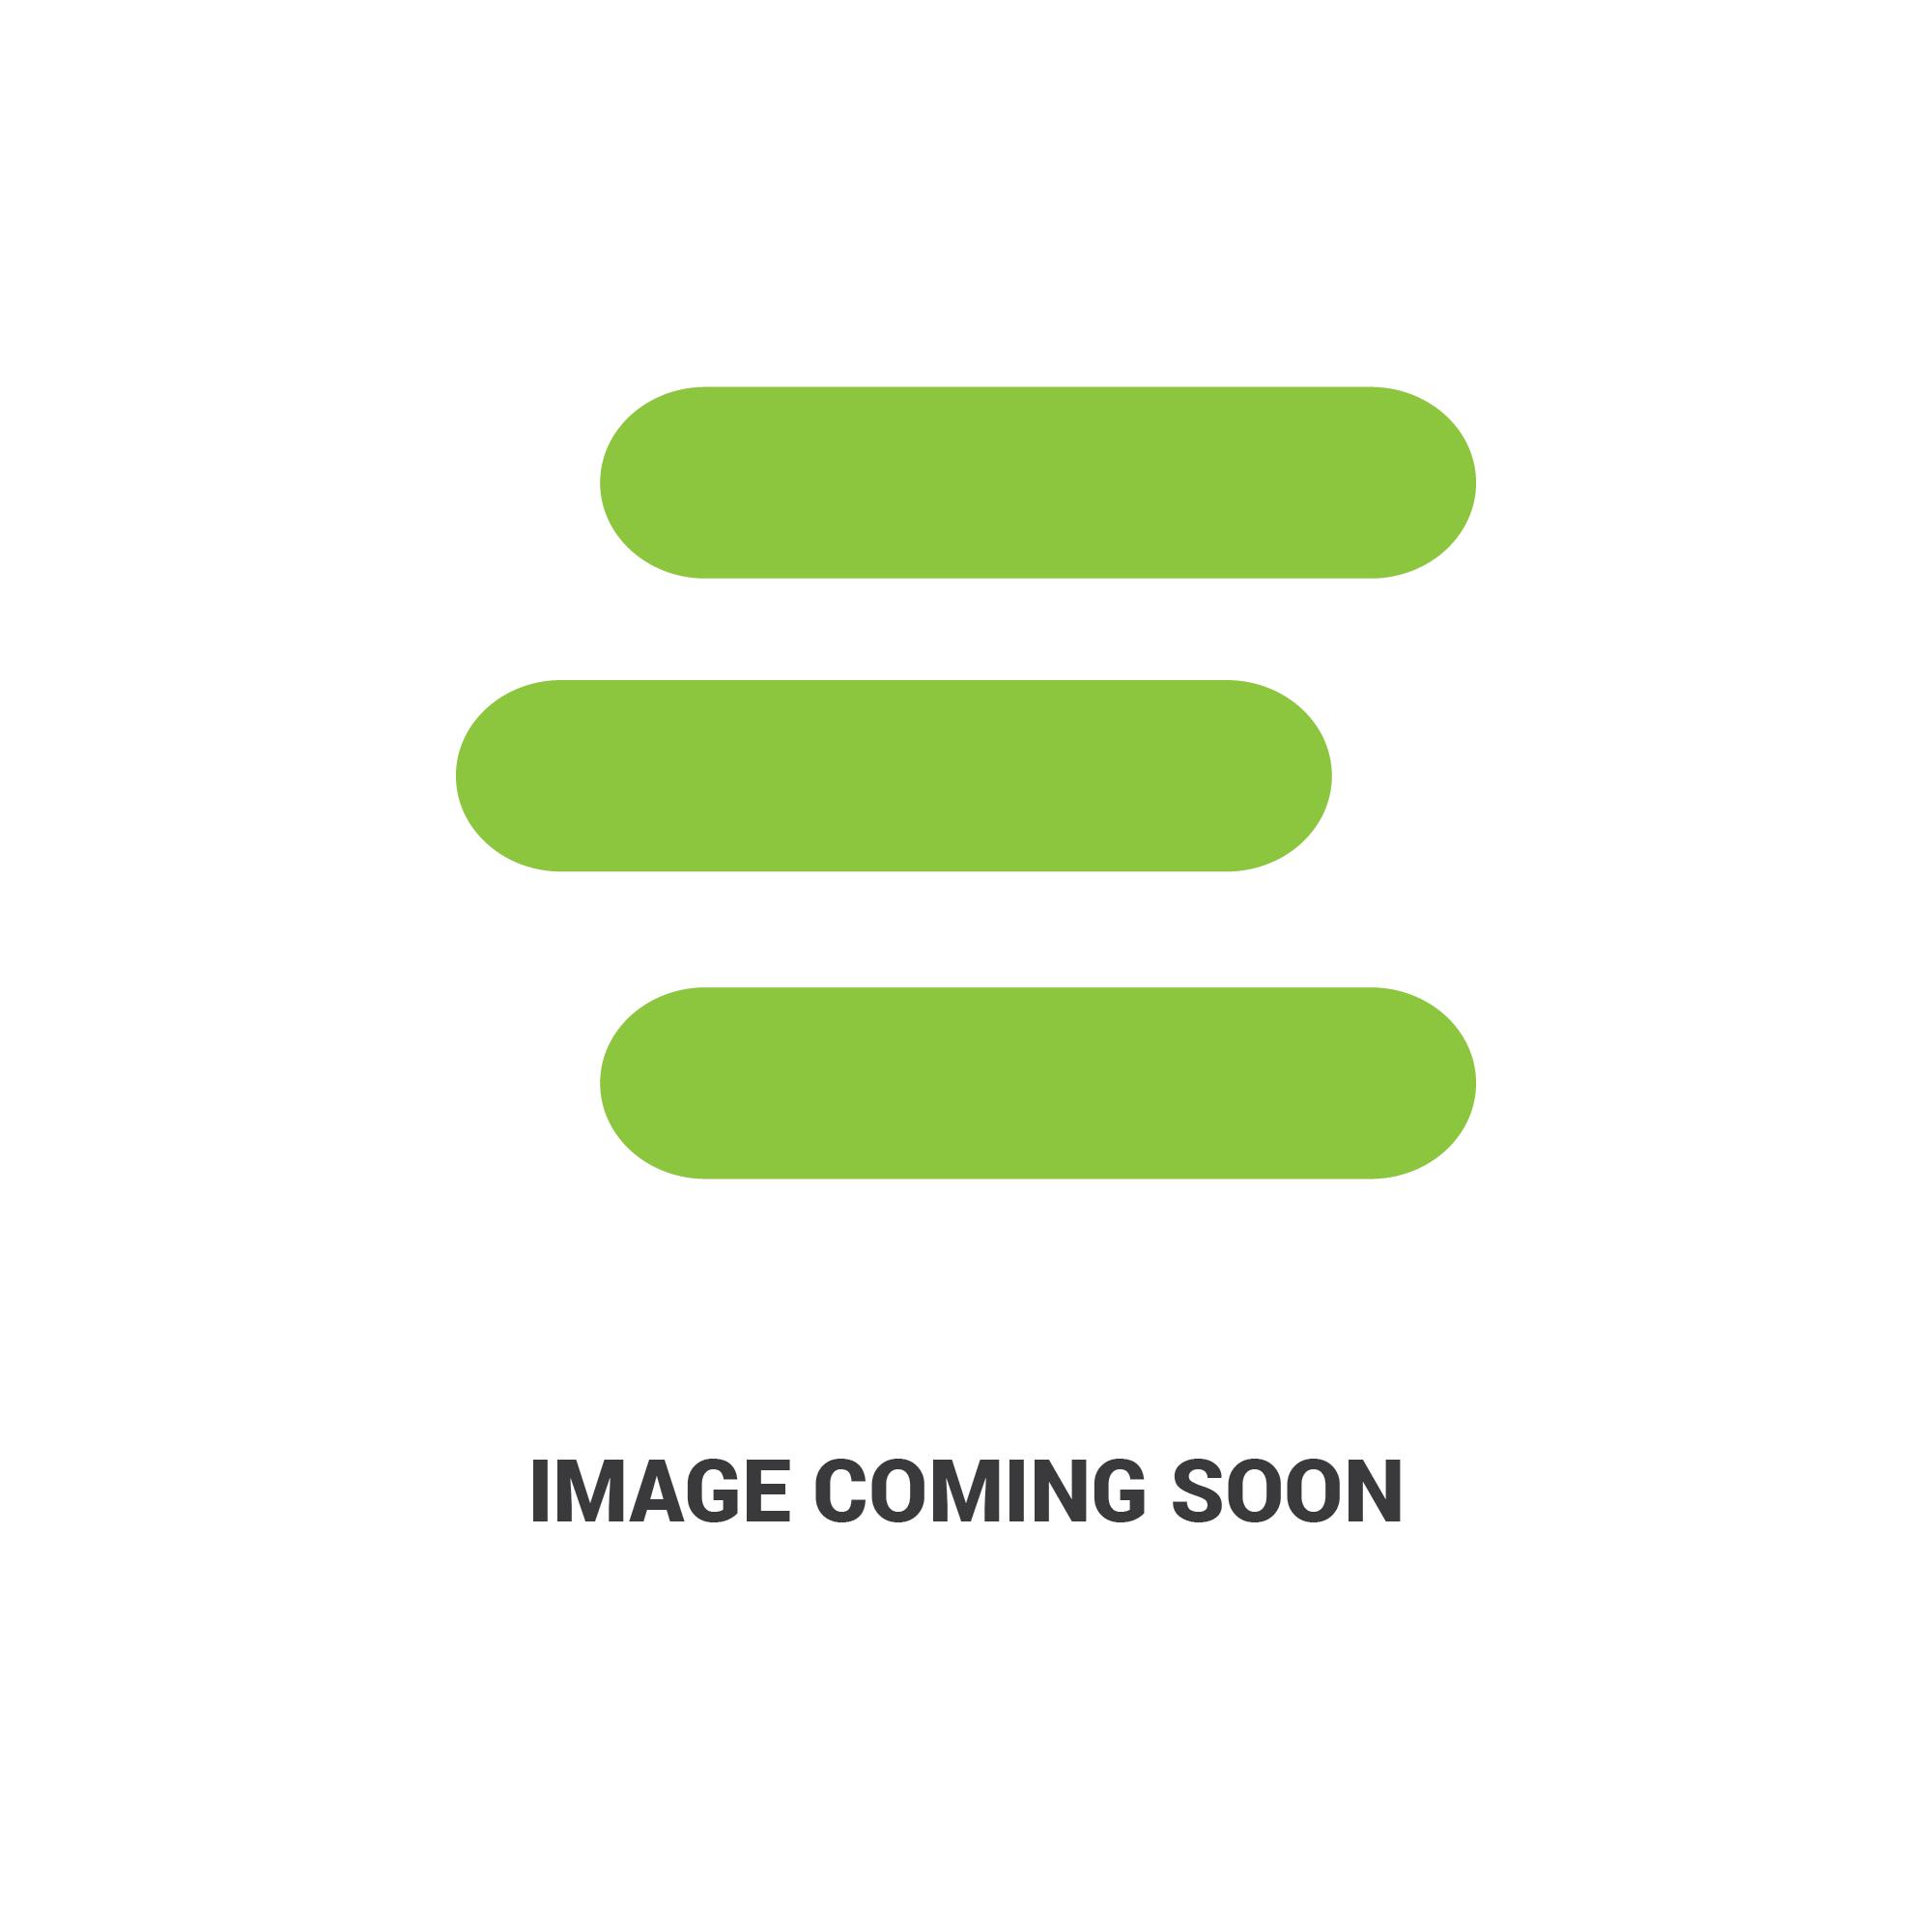 E-15241-32094edit 228.jpg